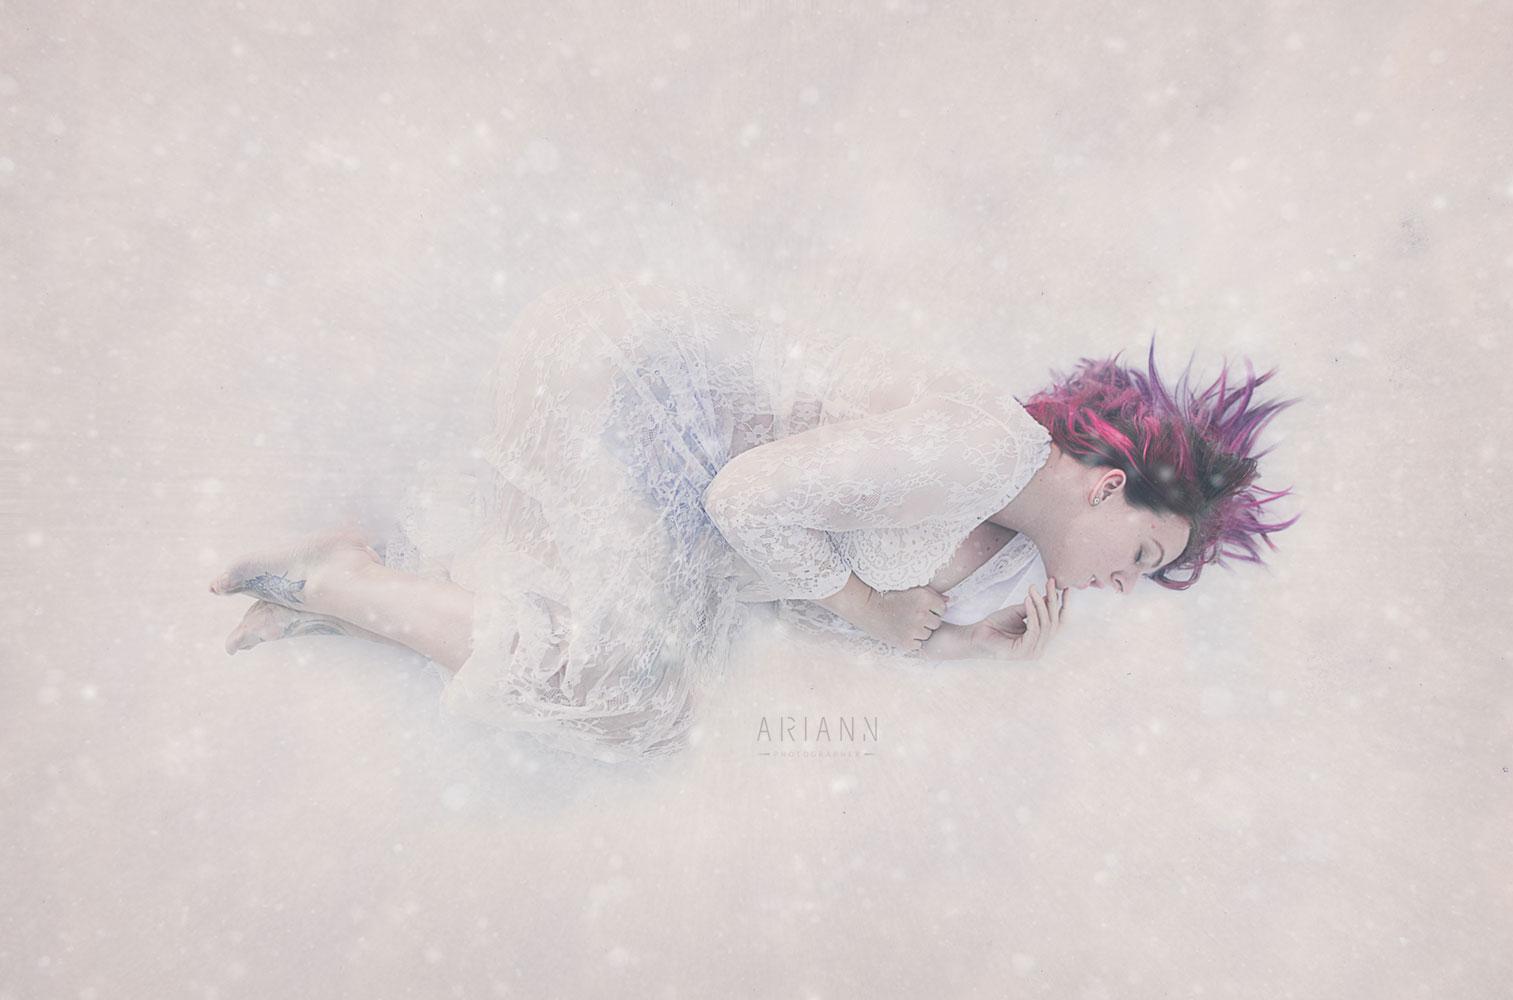 Fantasy winter selfportrait